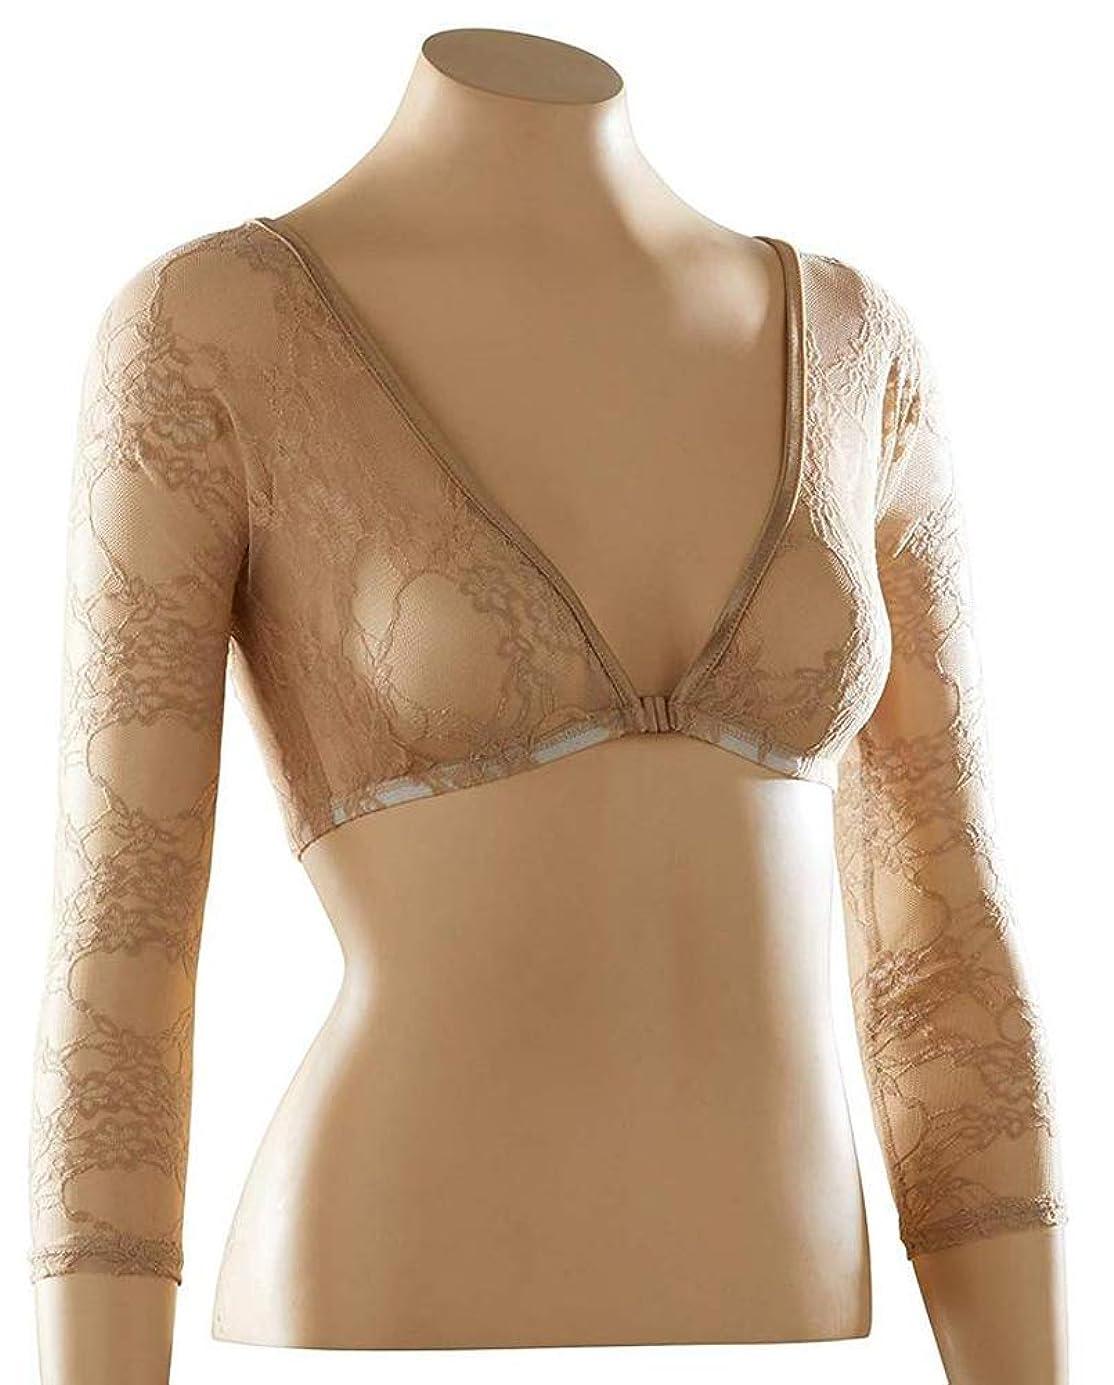 Sleevey Wonders Women's Basic 3/4 Length Slip-on Lace Sleeves trwaqp2253